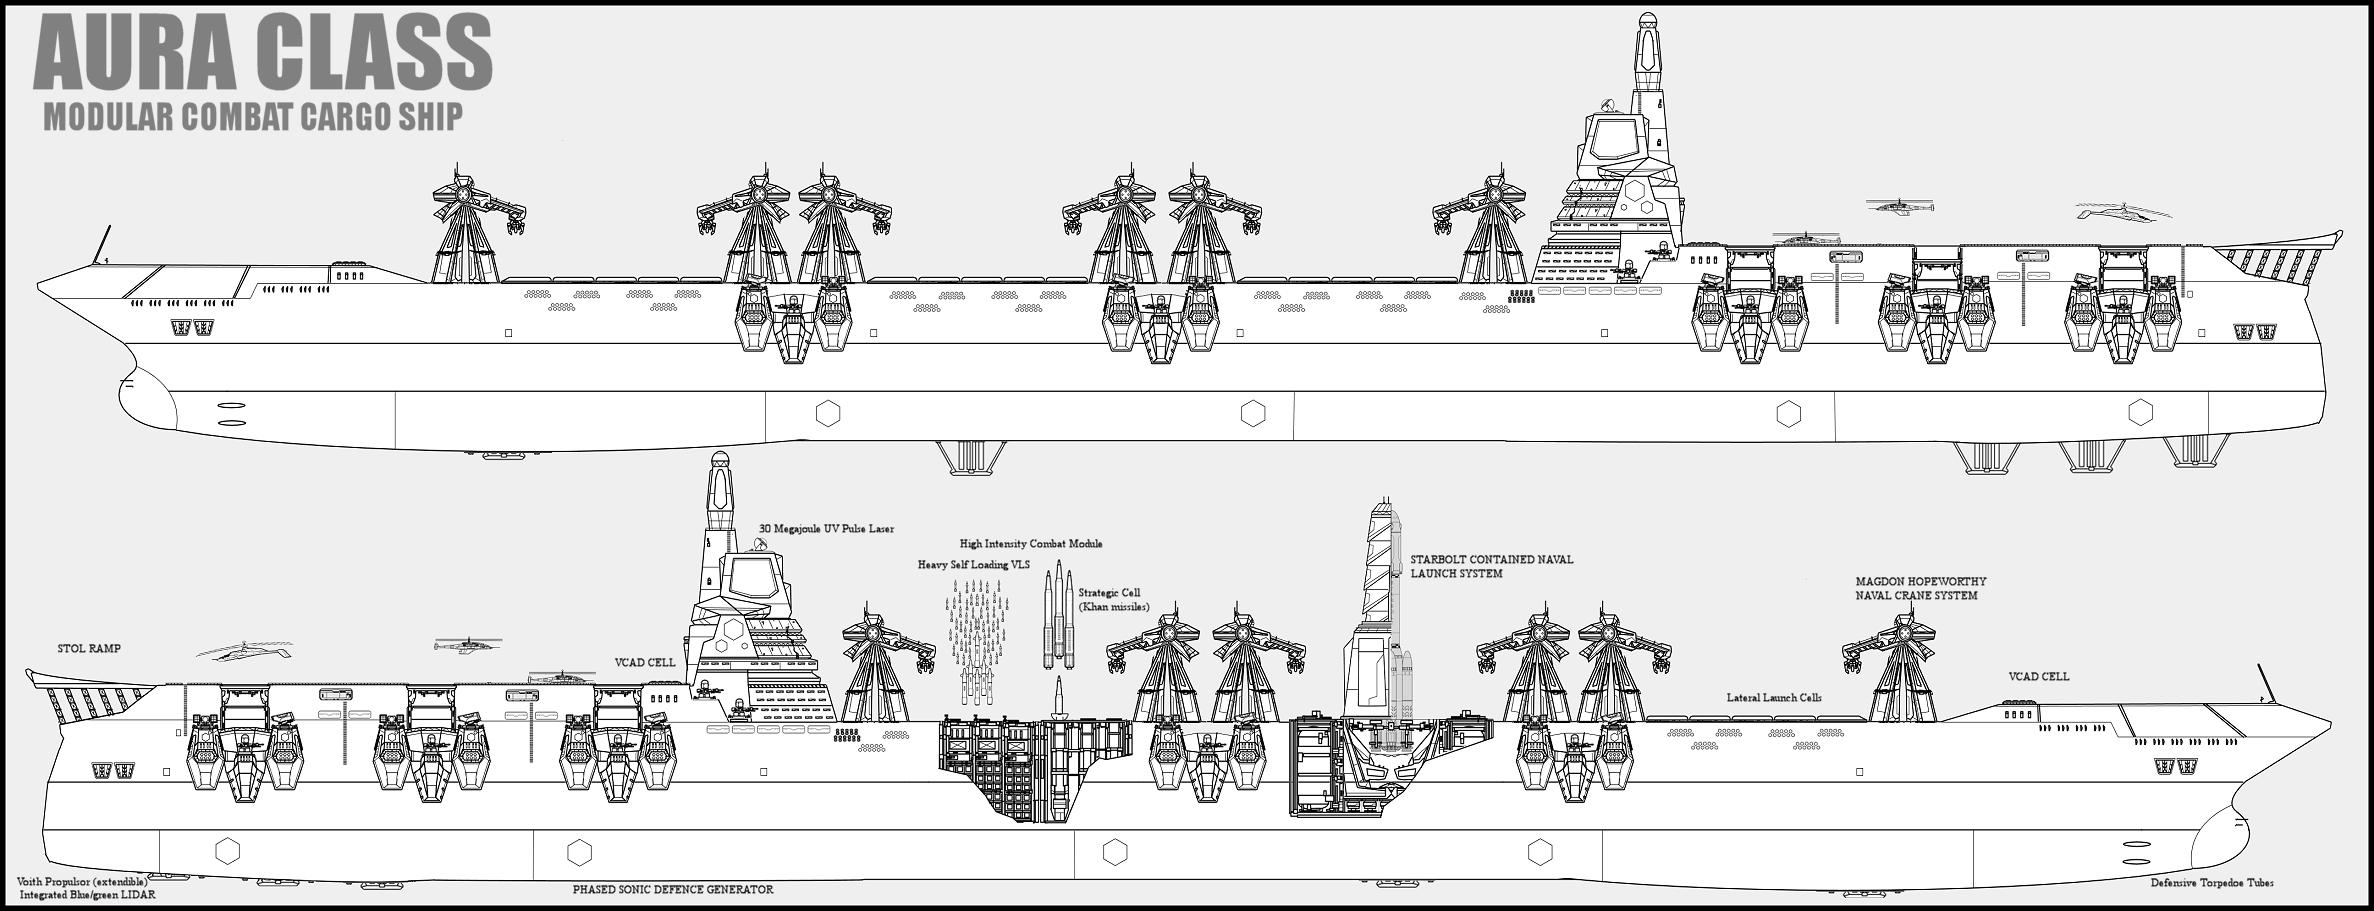 Aura class combat cargo ship by Lineartbob